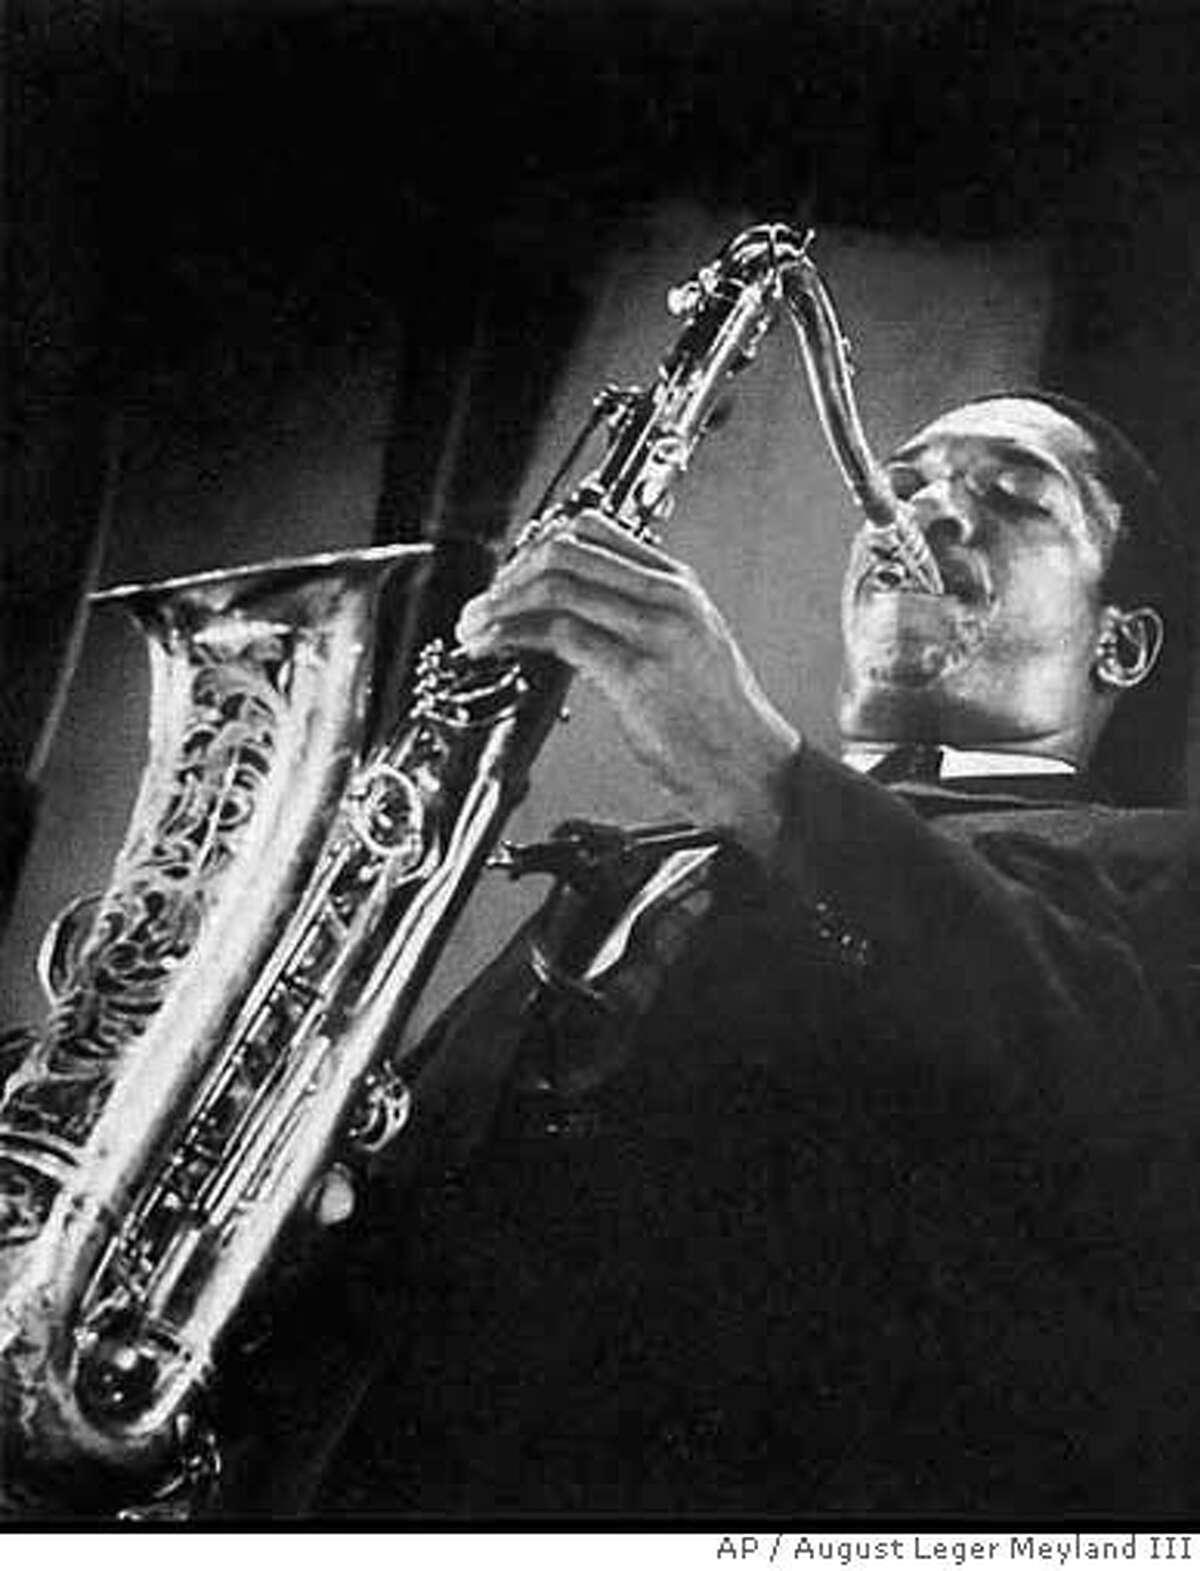 Jazz great John Coltrane plays in this undated photo. (AP Photo/August Leger Meyland III)